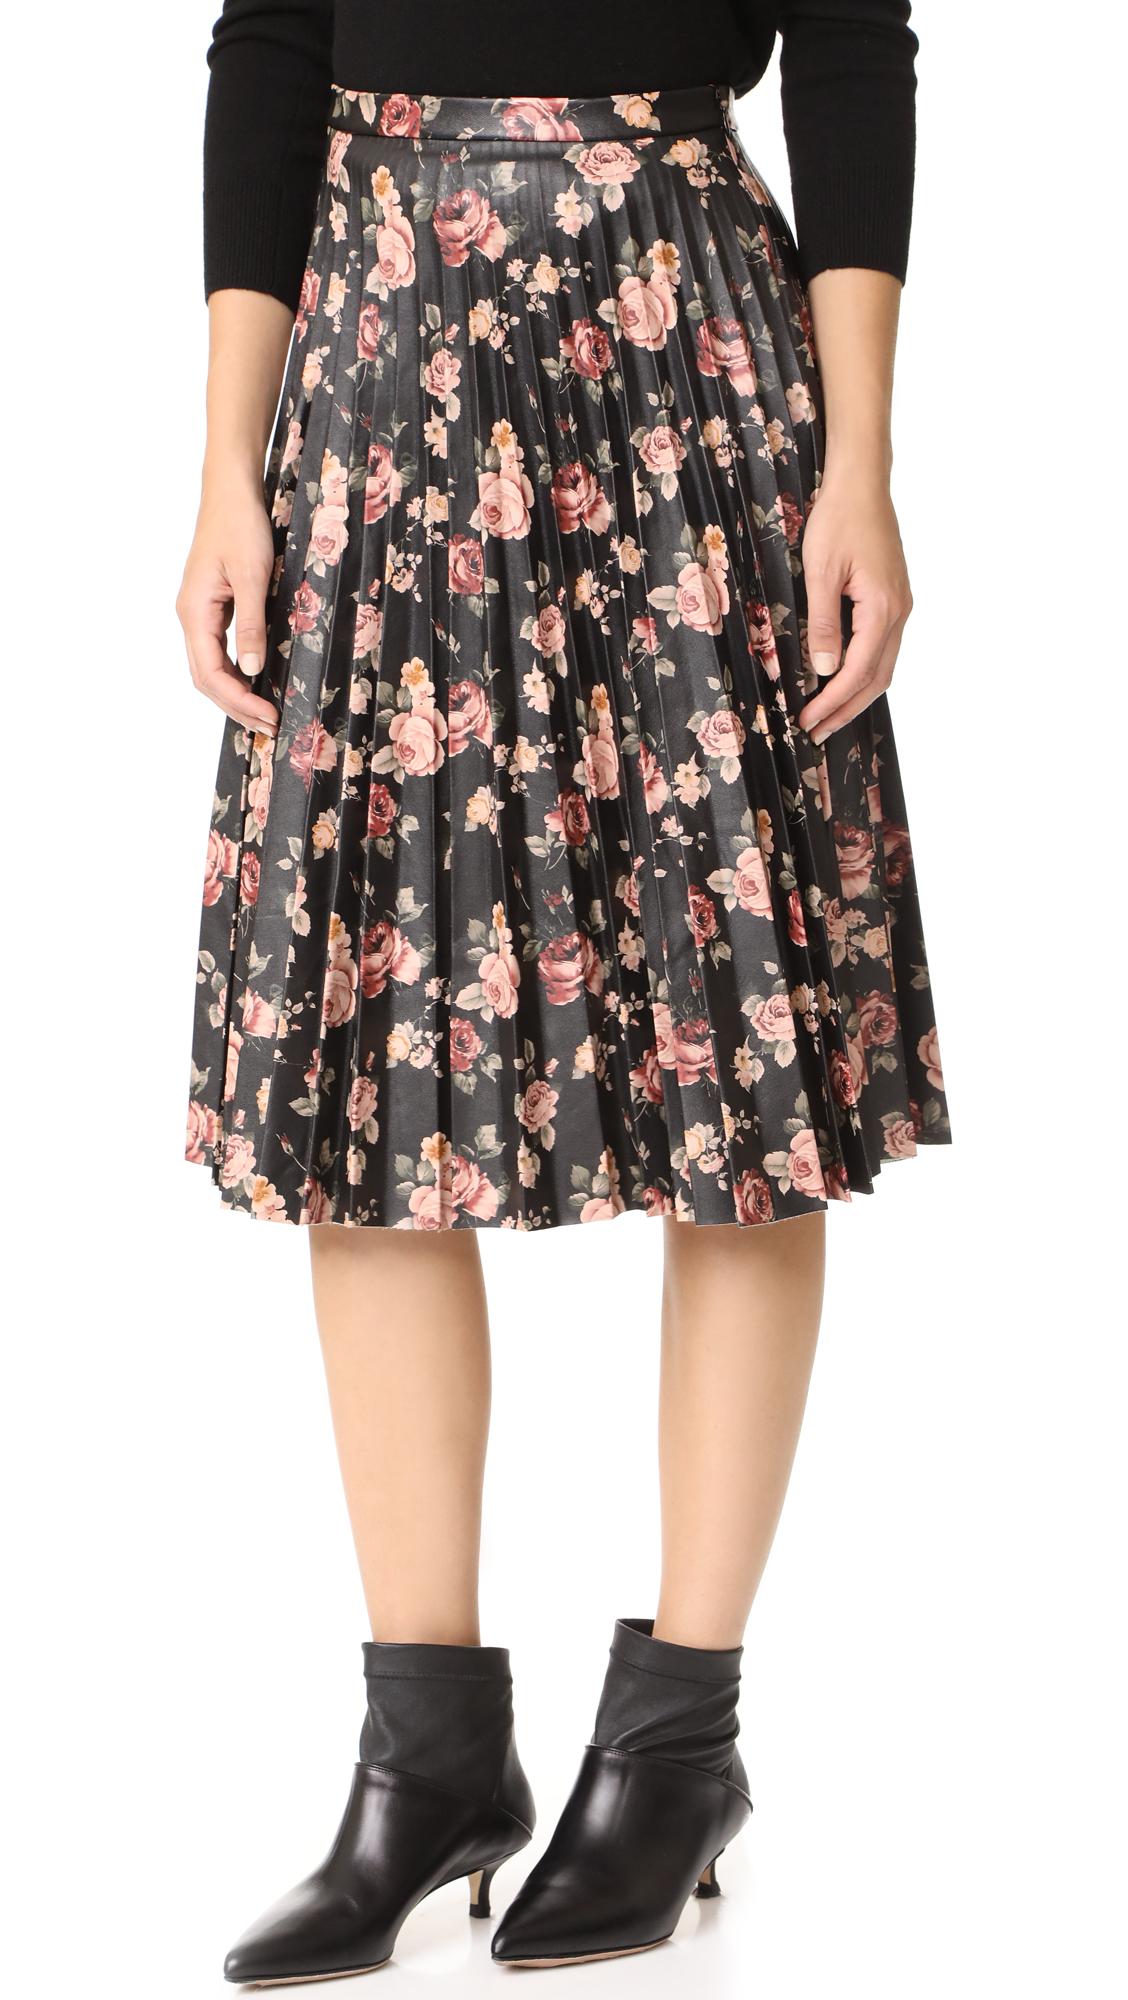 BB Dakota Abela Printed Pleated Skirt - Dark Brown